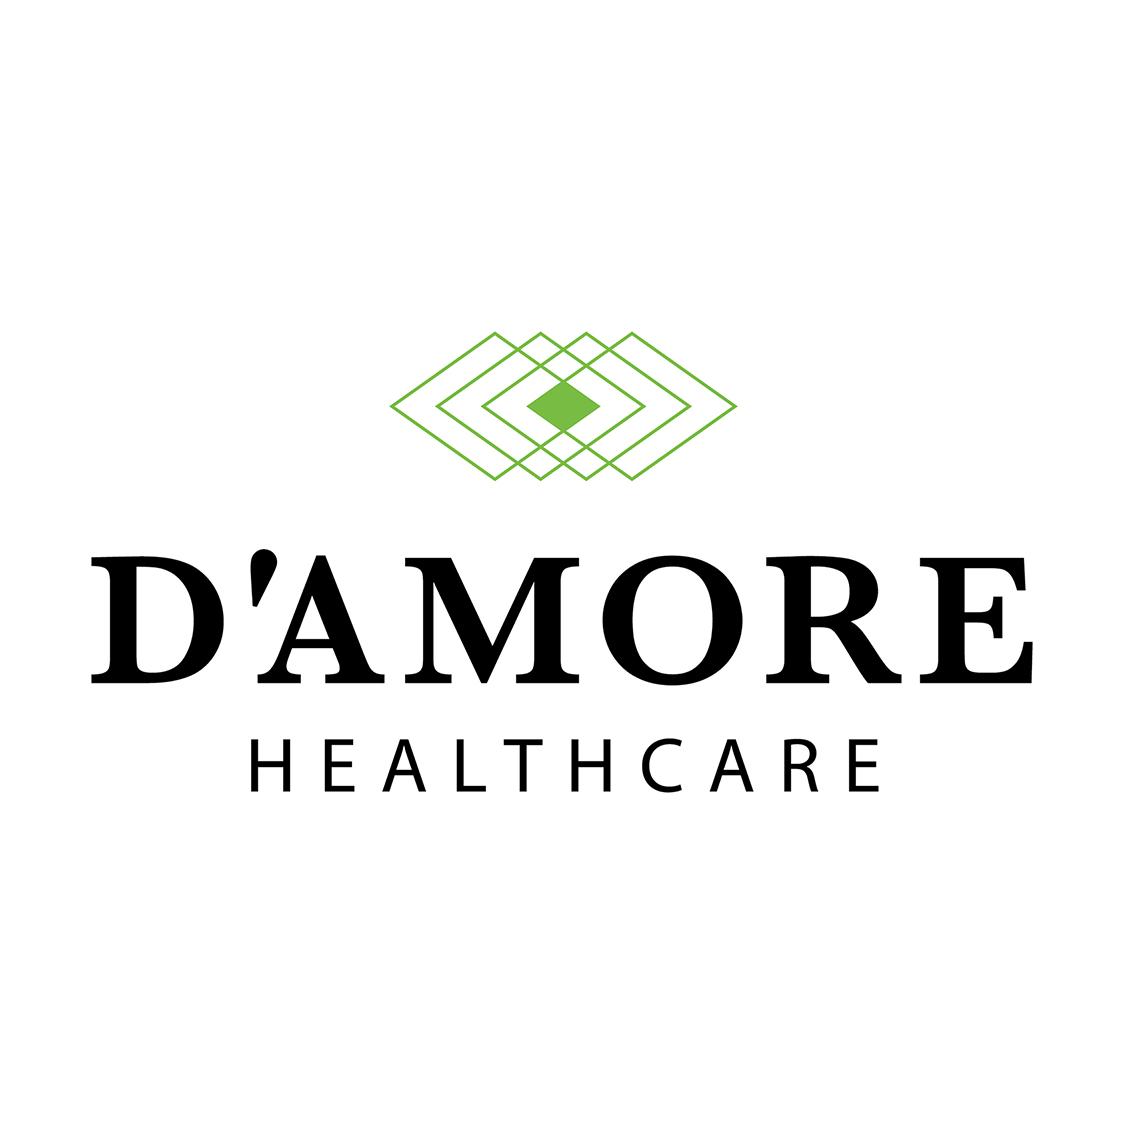 D'amore Healthcare Announced Virtual Care Amid Lockdown